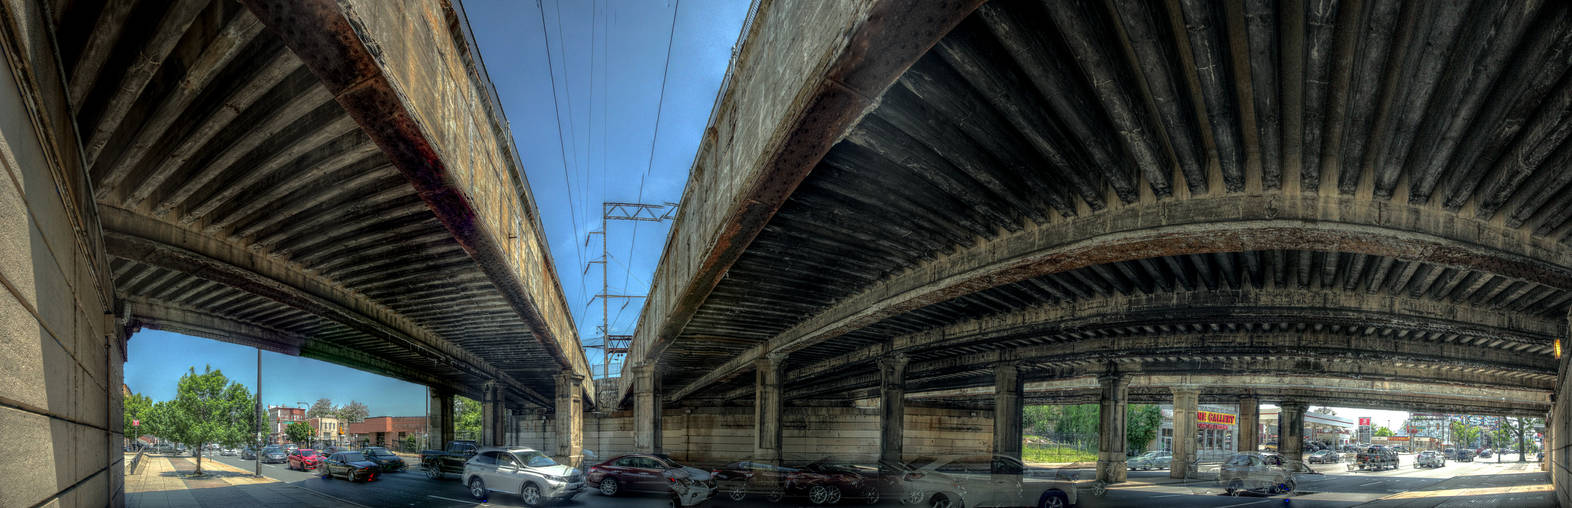 Panorama 4073 hdr pregamma 1 mantiuk06 contrast ma